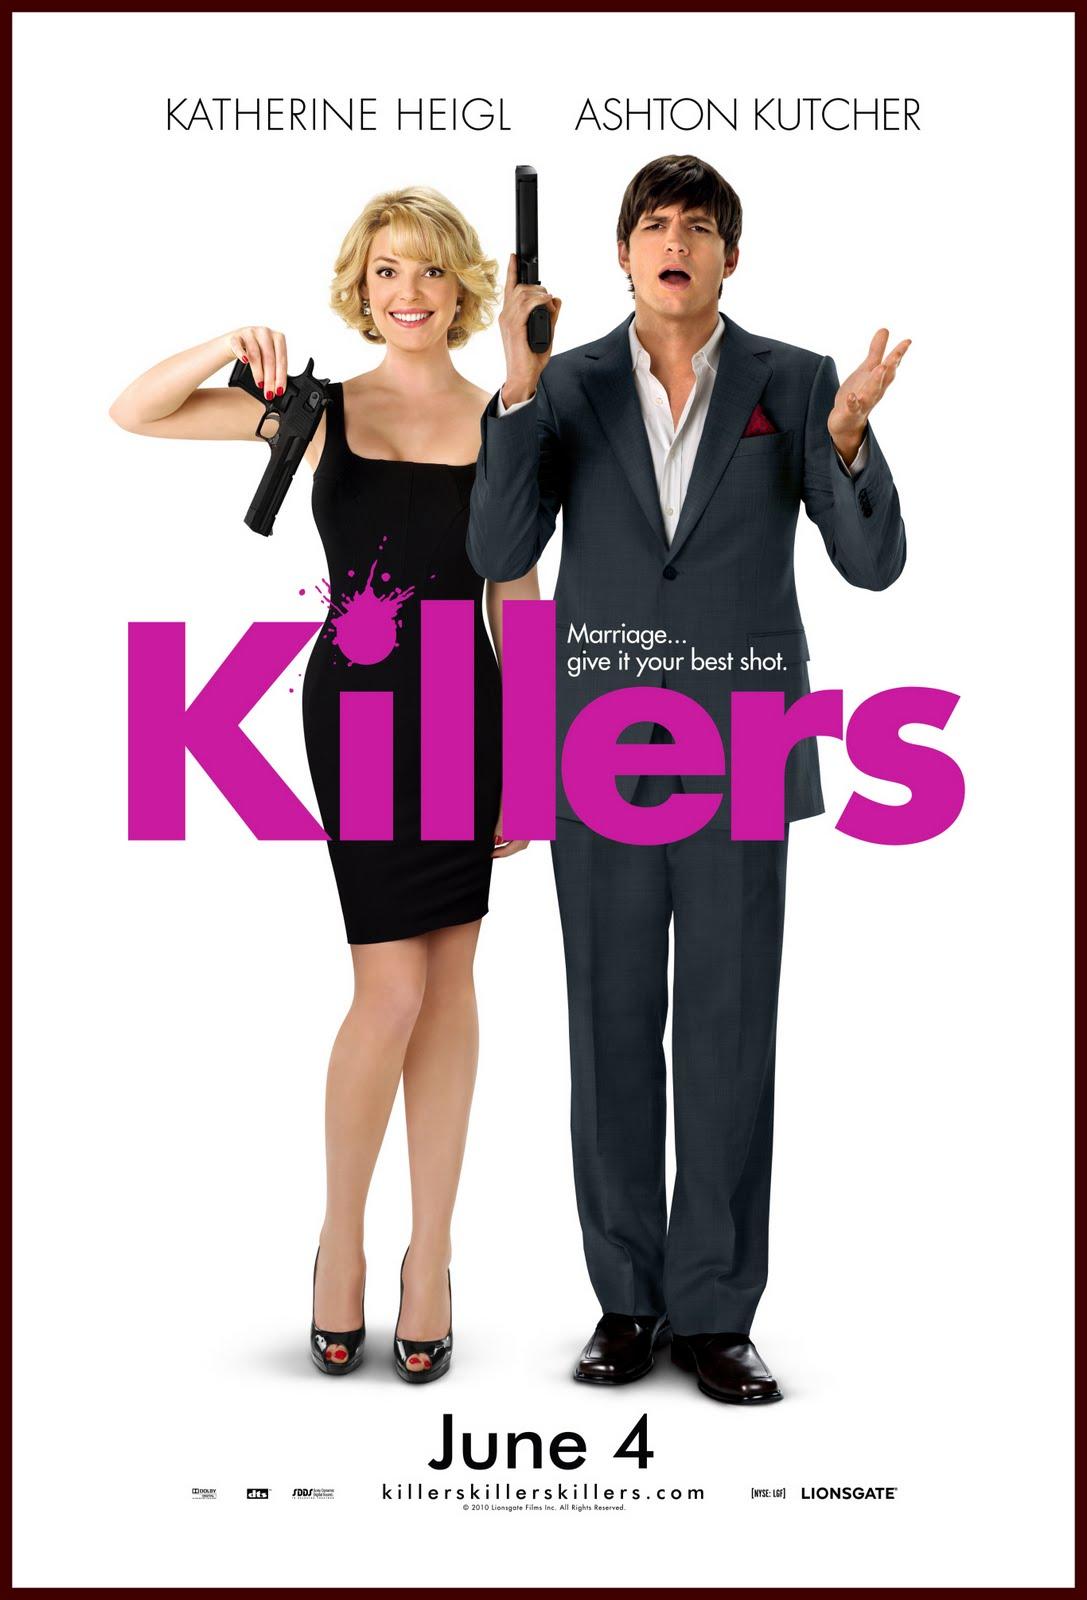 http://4.bp.blogspot.com/_hnkvGzU_v84/TE-FEzkXmbI/AAAAAAAABmY/pmXxTu-hK2o/s1600/killersposter2.jpg